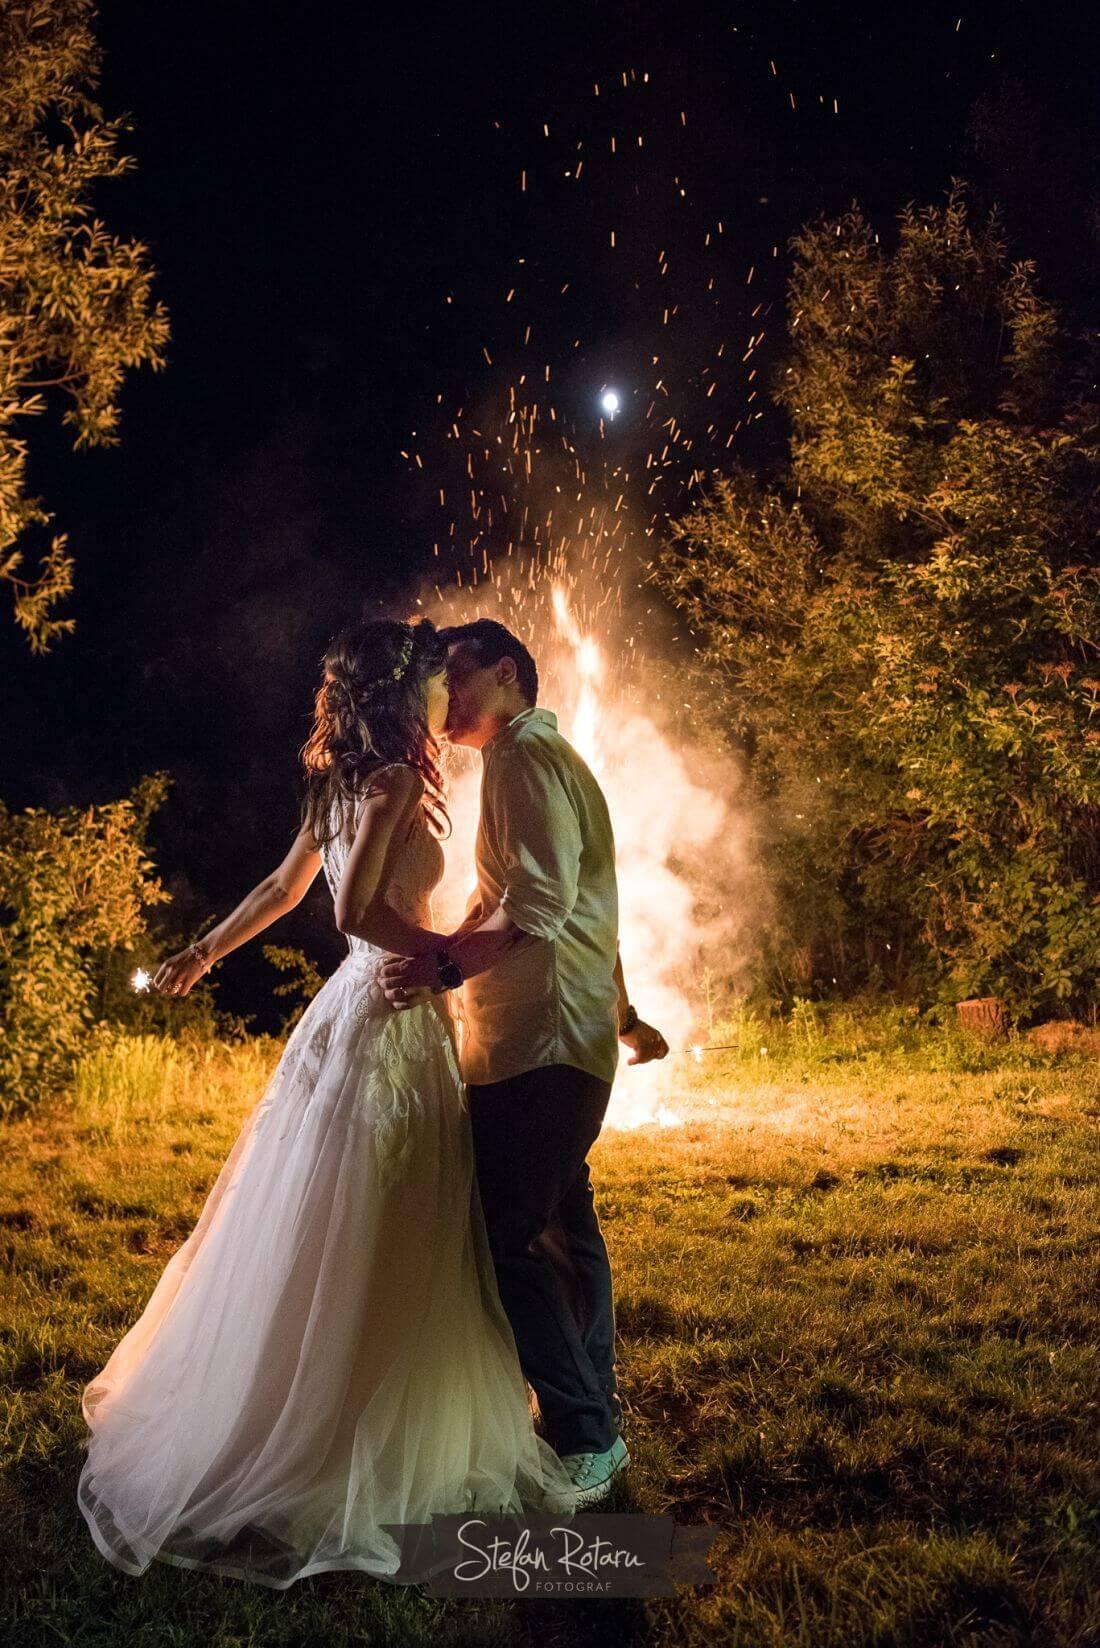 Petrecere ca-n Vama Veche - Alina si Cristi-IDO-Weddings-nuntiinaerliber (16)